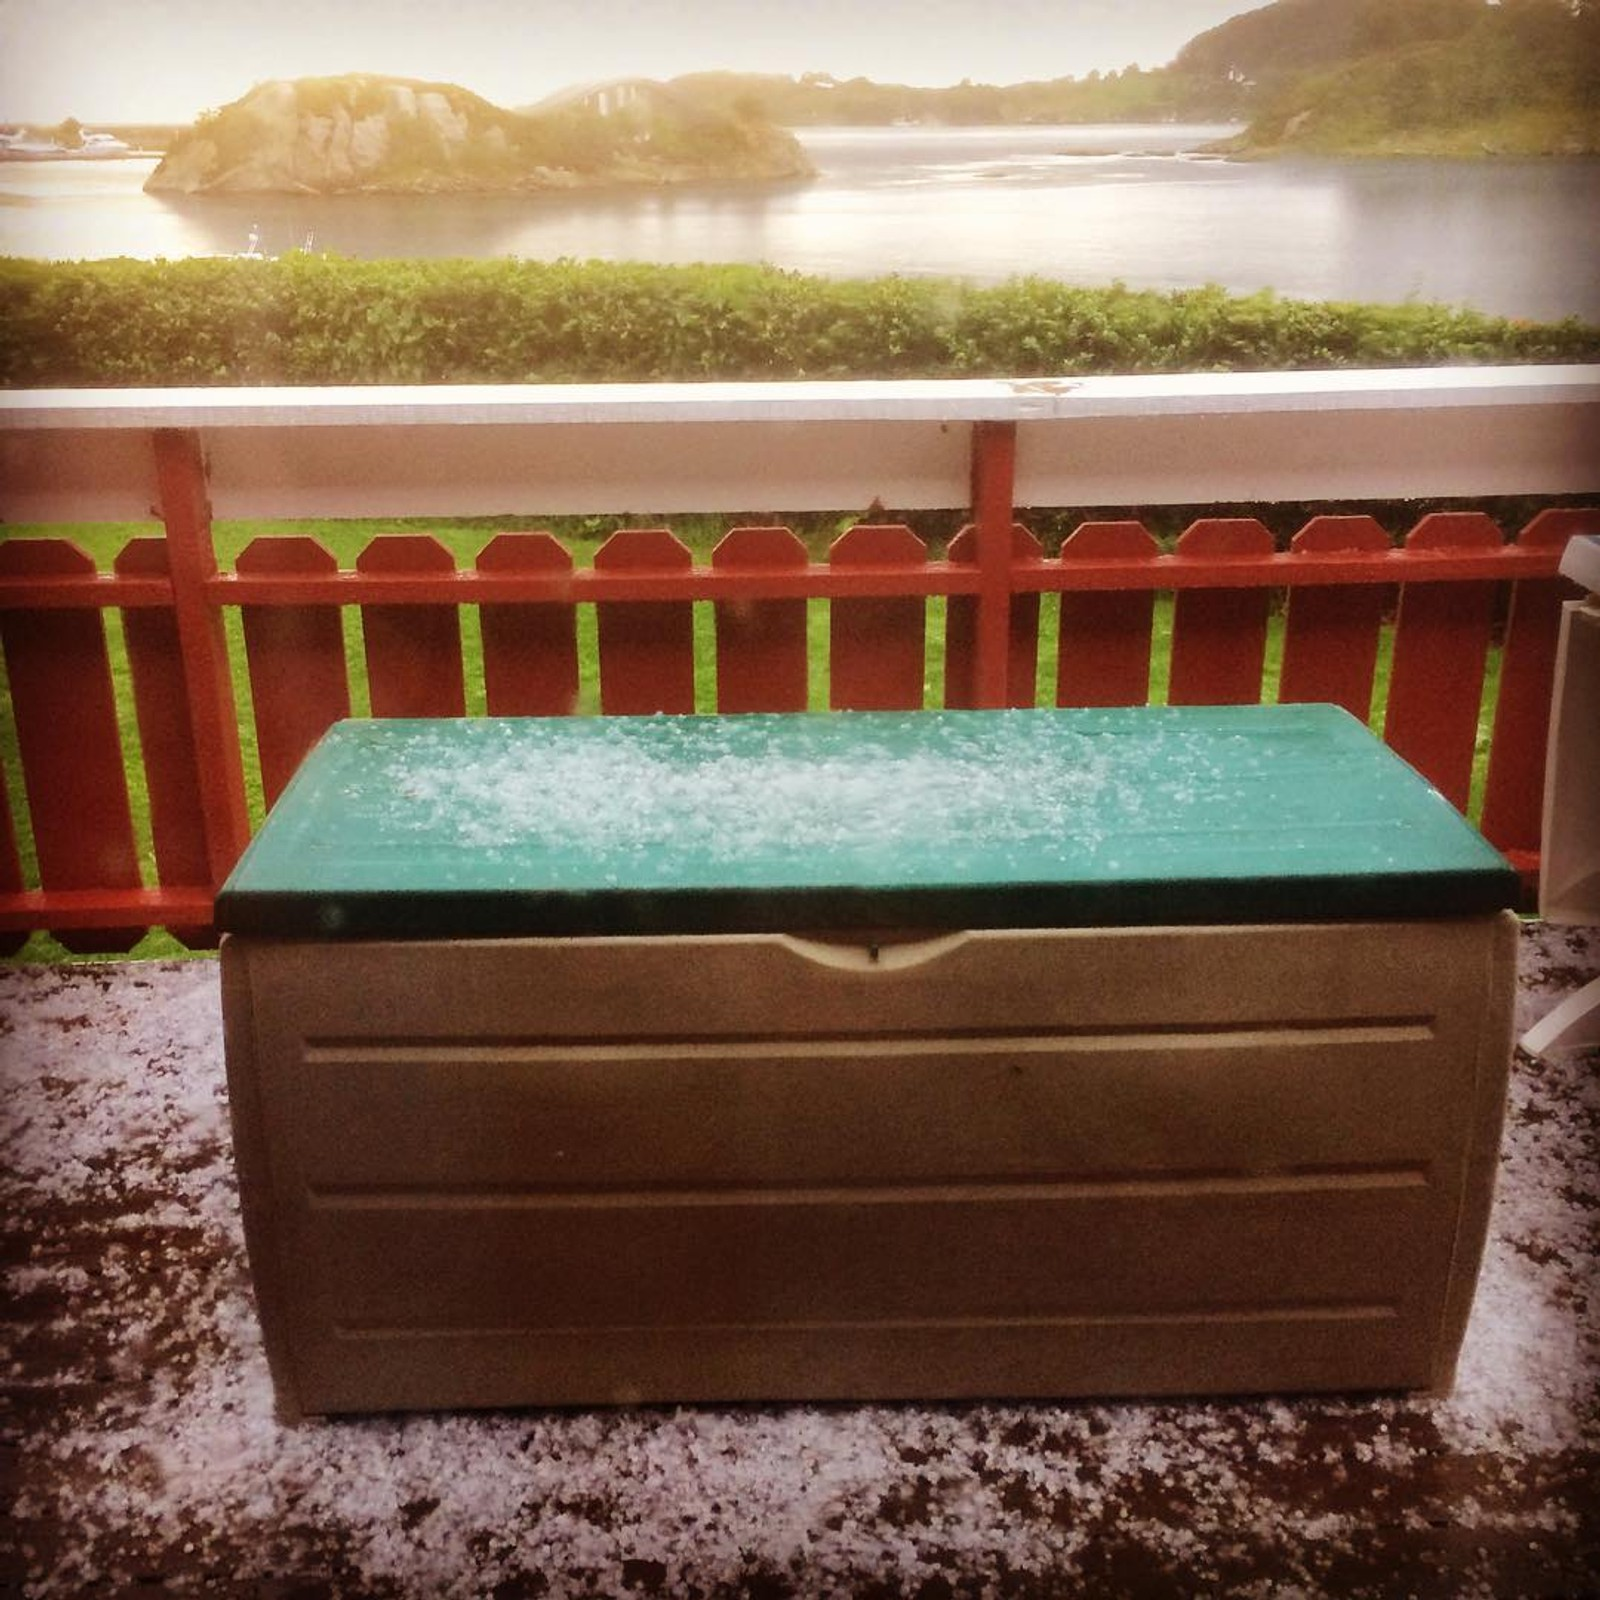 #sokn #rennesøy #vinter?